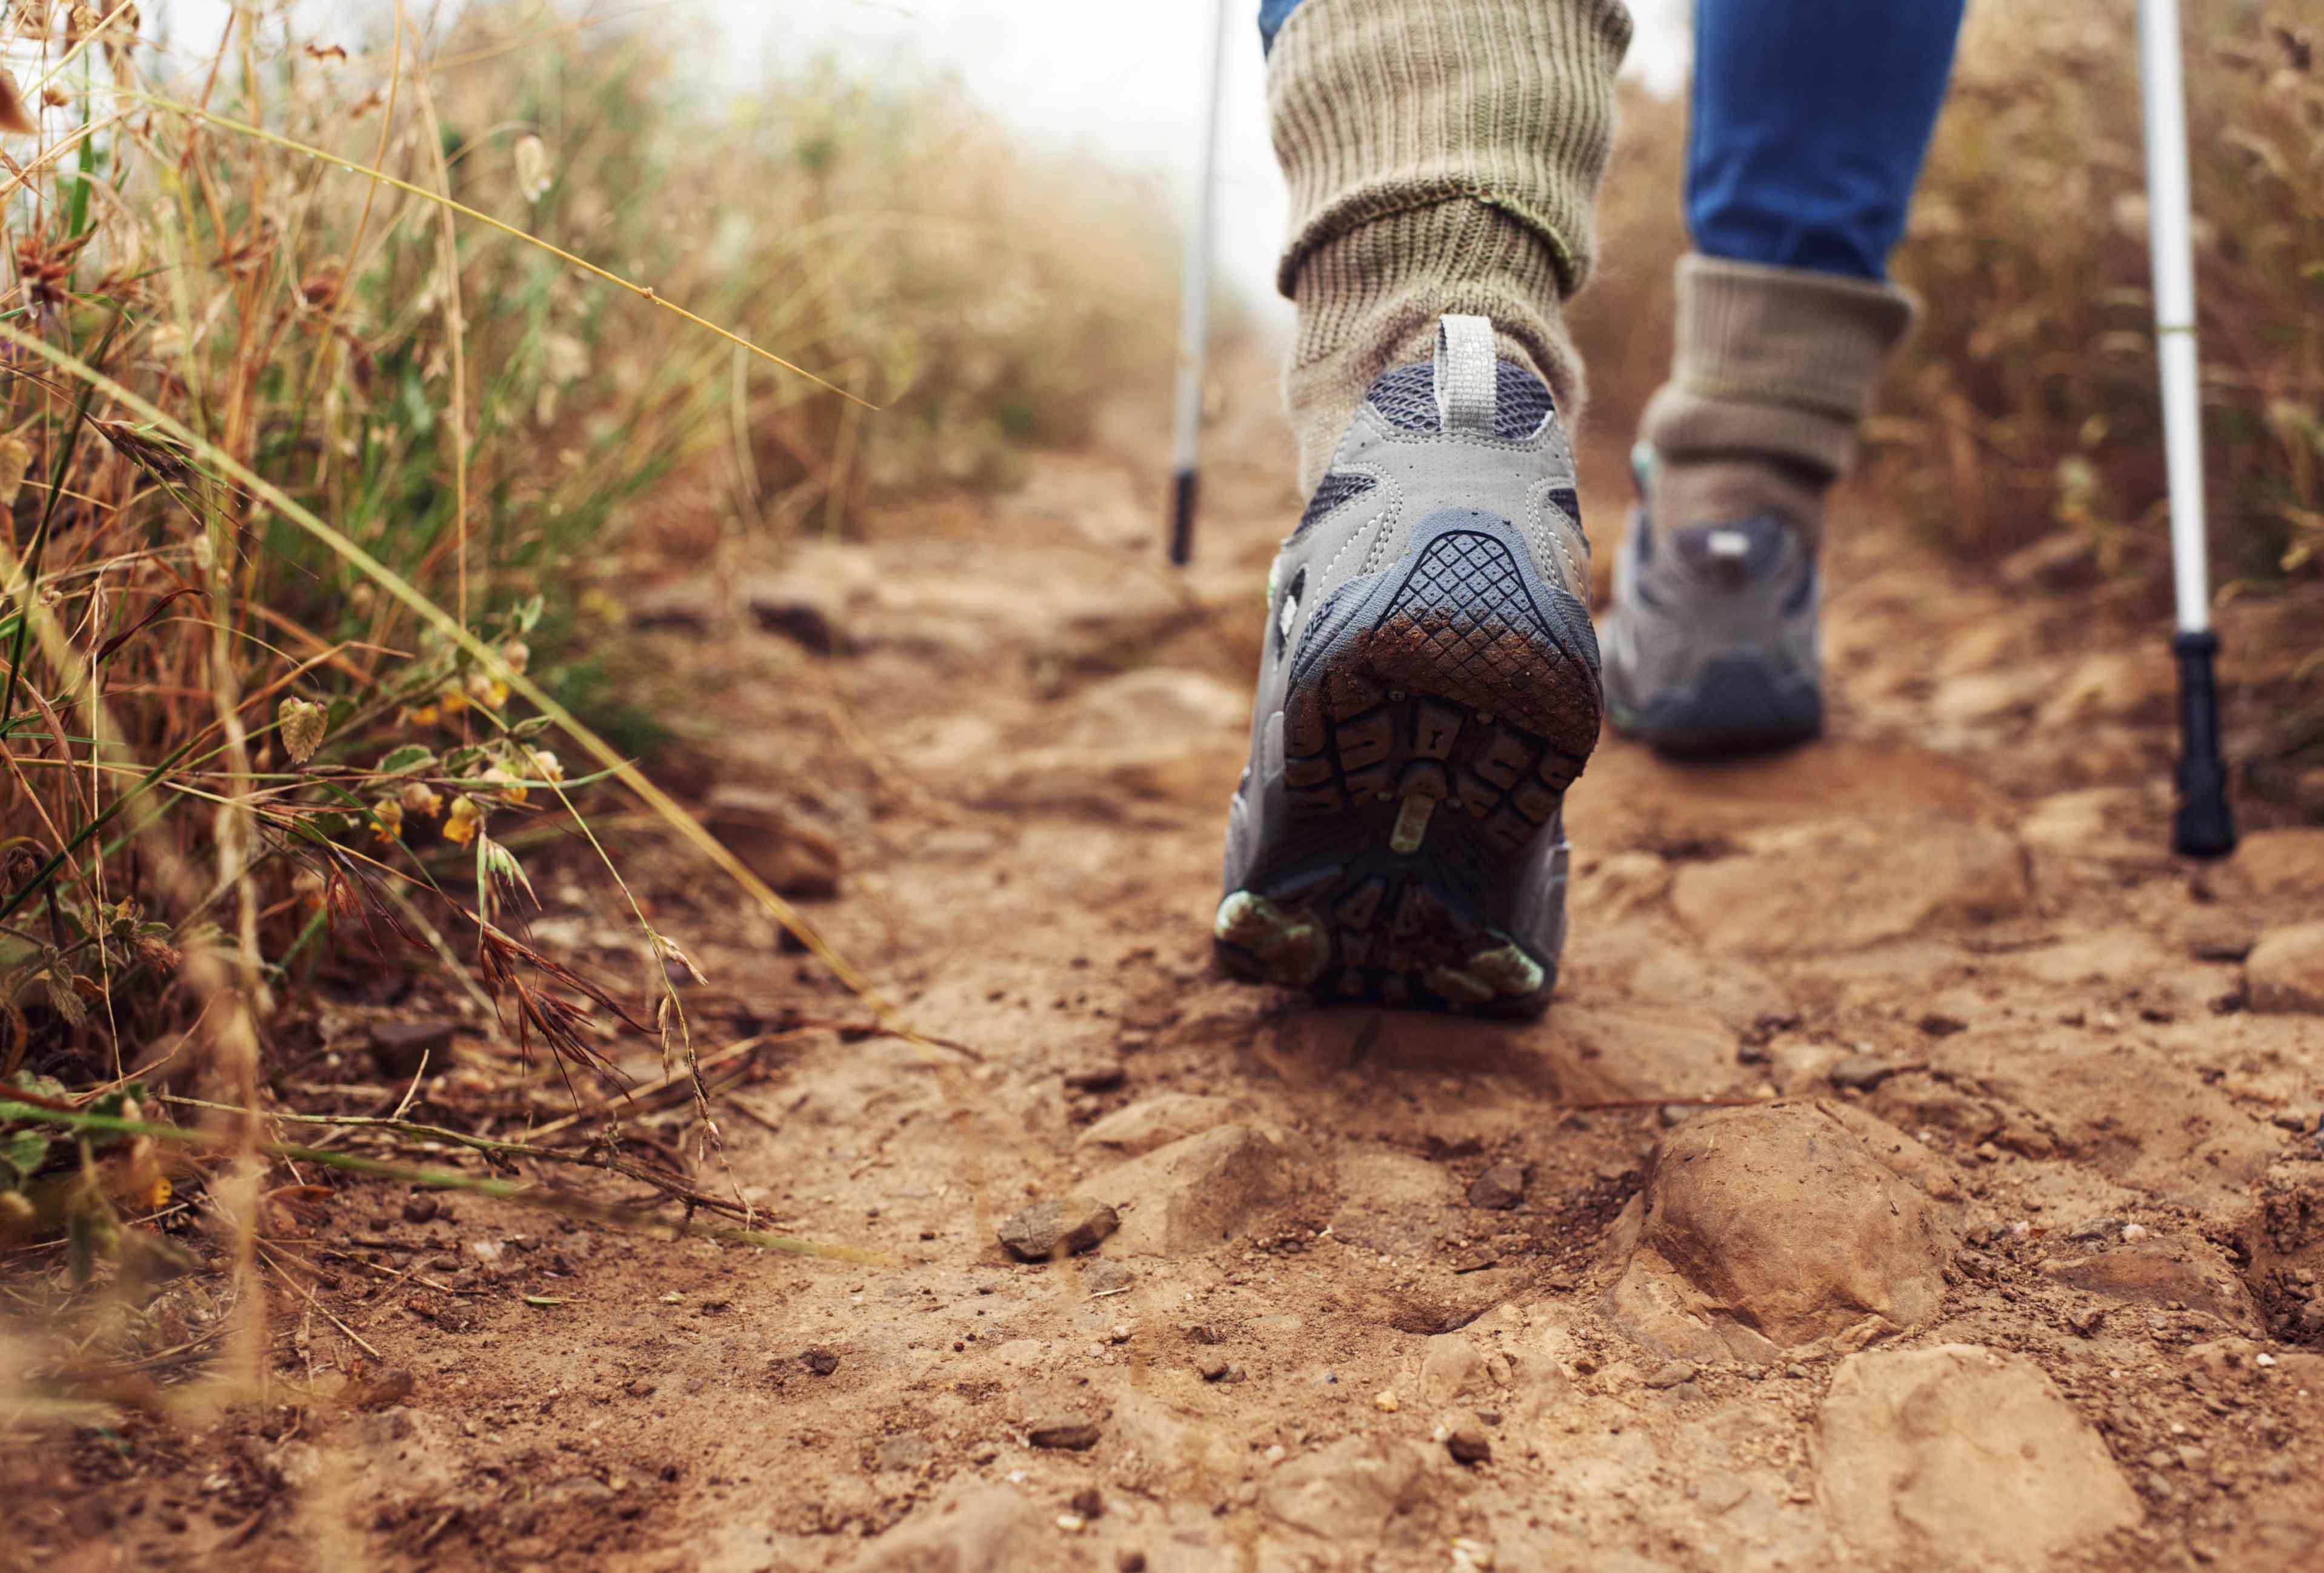 Hiking story